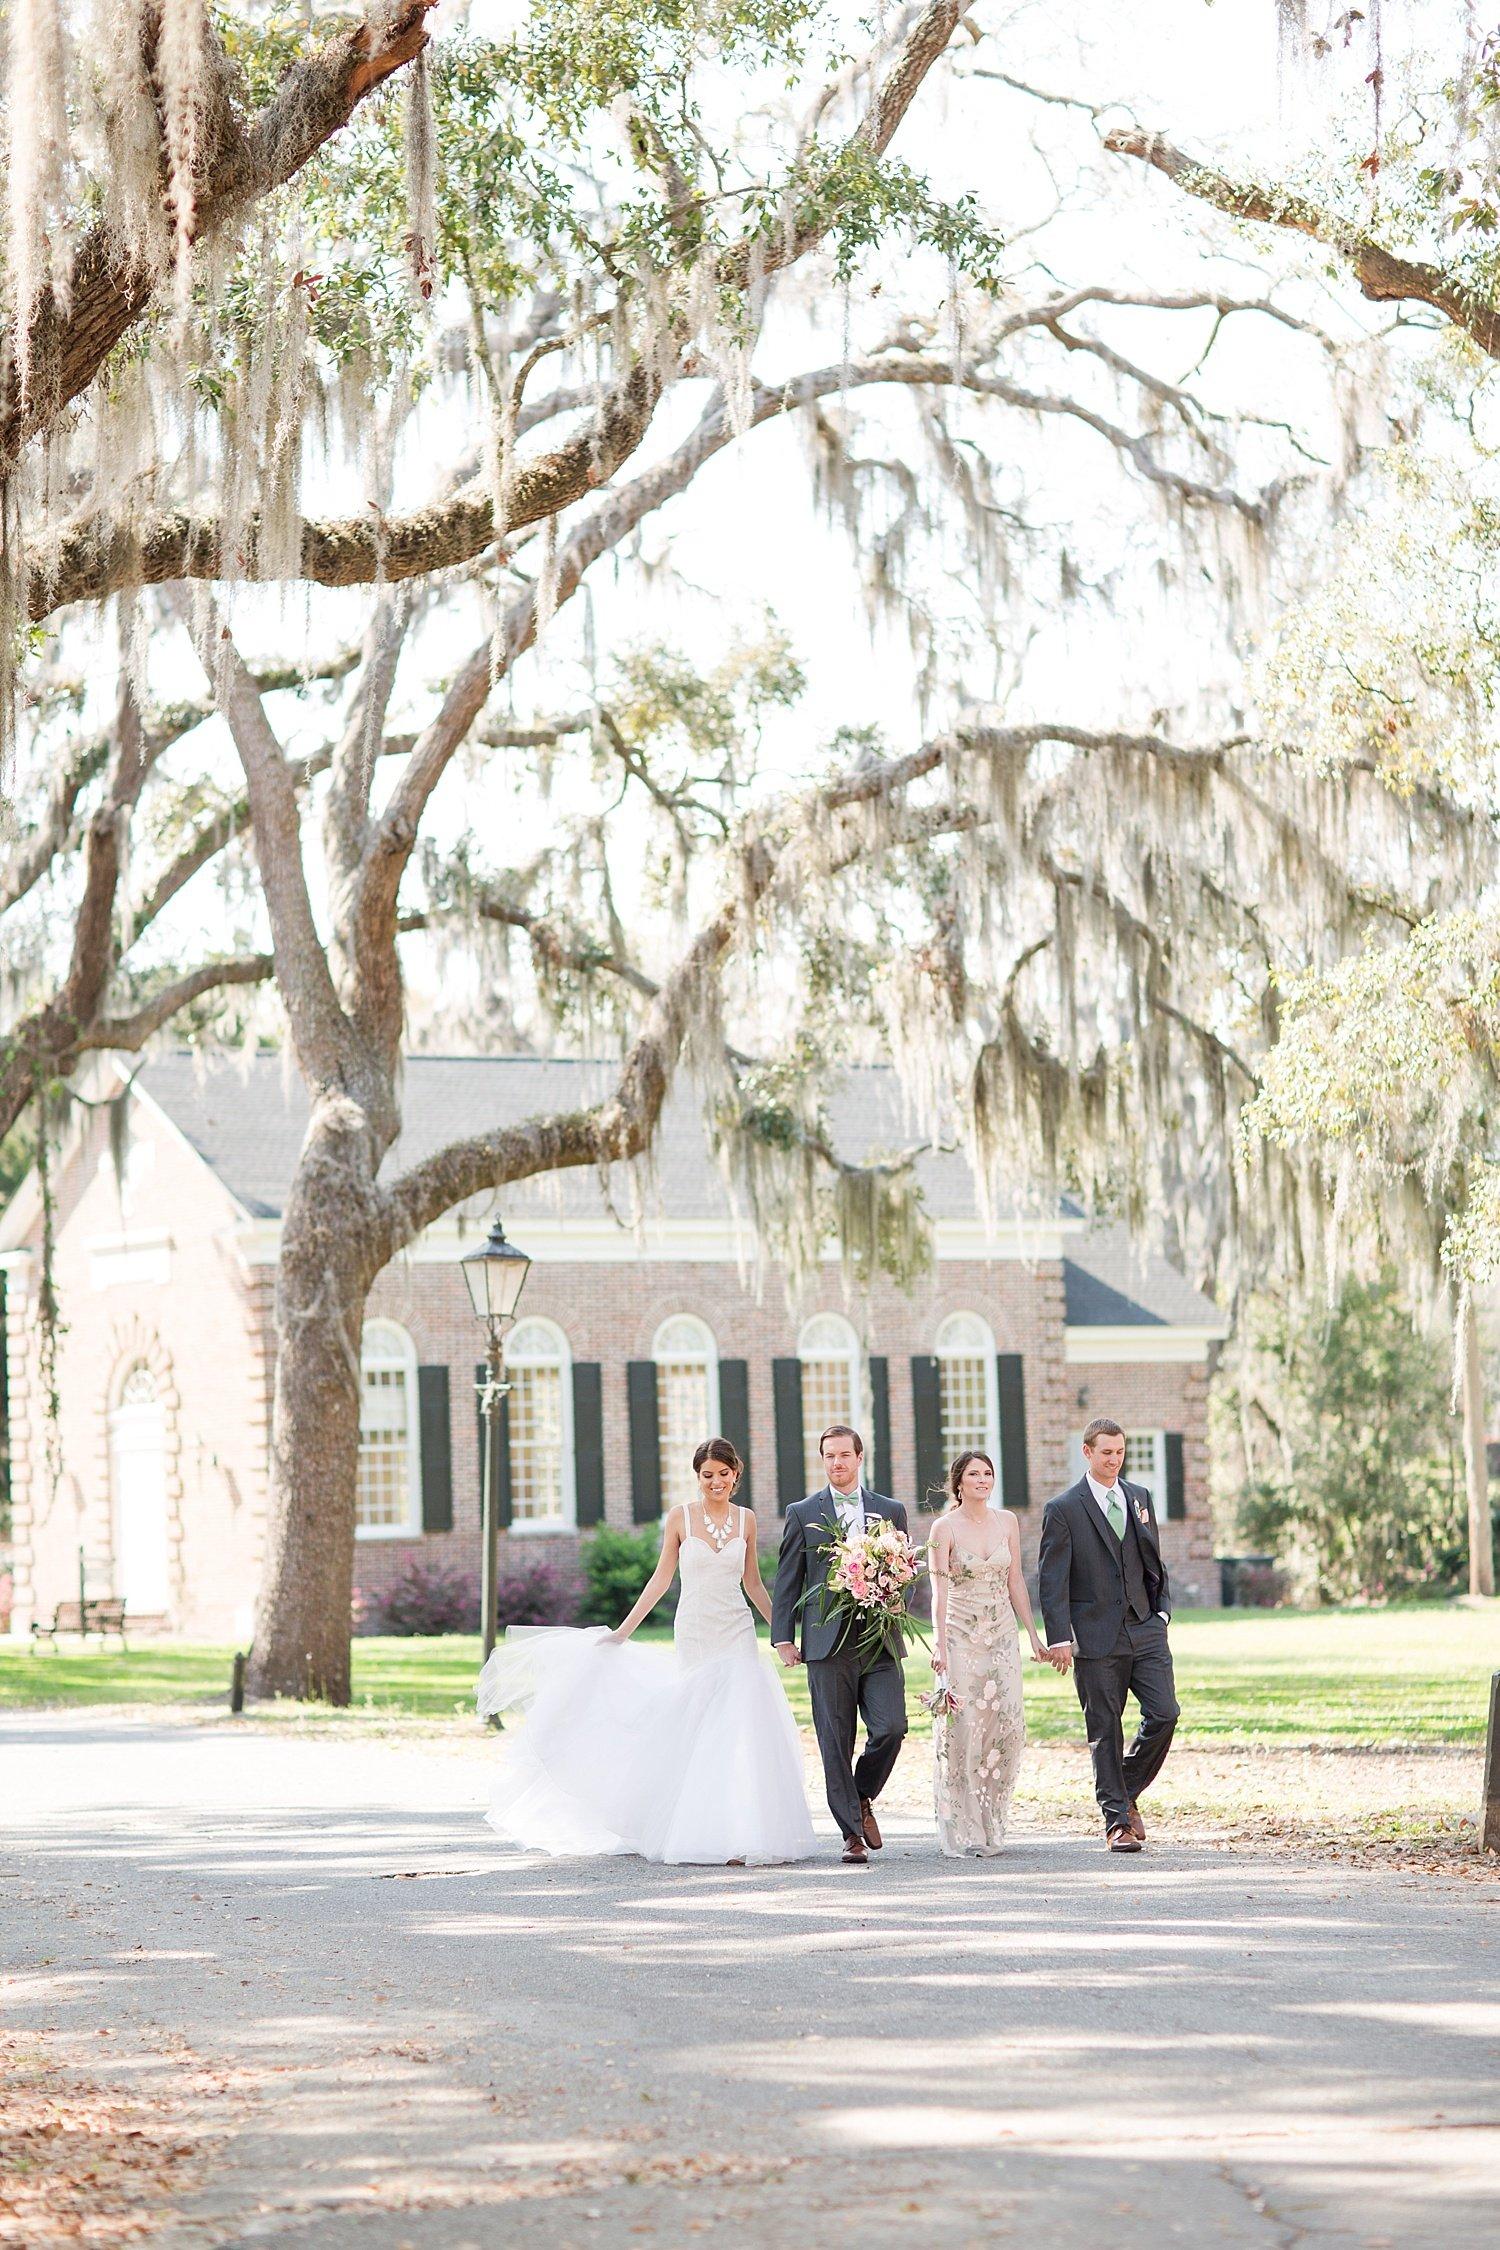 rachel-strickland-photography-katie-may-ivory-and-beau-bridal-boutique-bethesda-academy-wedding-whitfield-chapel-wedding-savannah-bridal-boutique-savannah-weddings-savannah-wedding-savannah-wedding-planner-savannah-bridal-gowns-savannah-bride-20.jpg